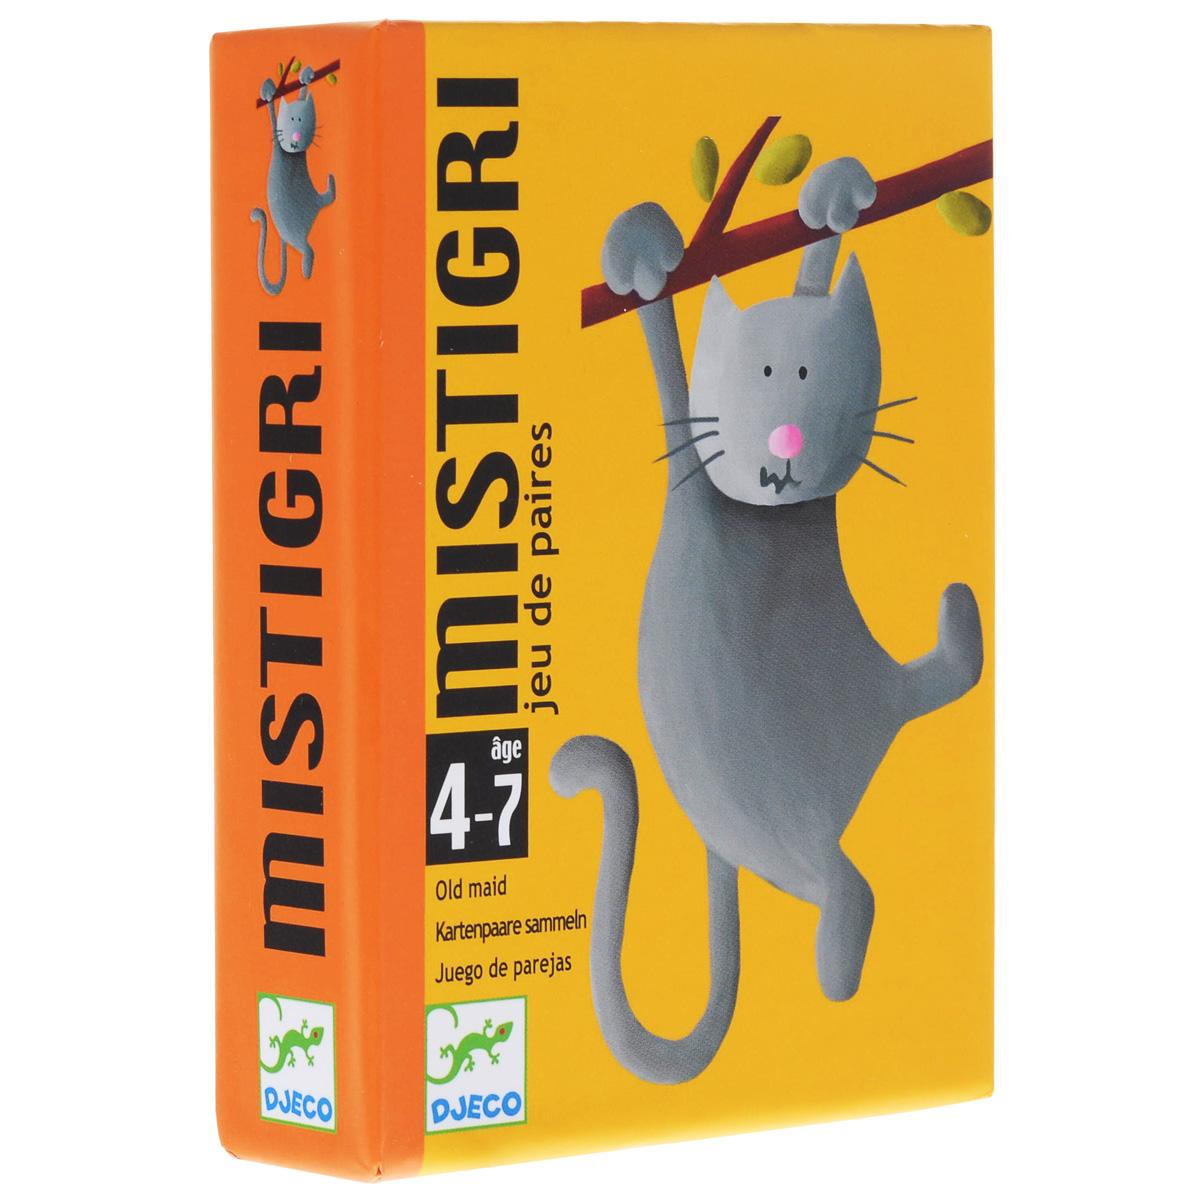 Djeco Обучающая игра Мистигри игра тактильное лото животные djeco